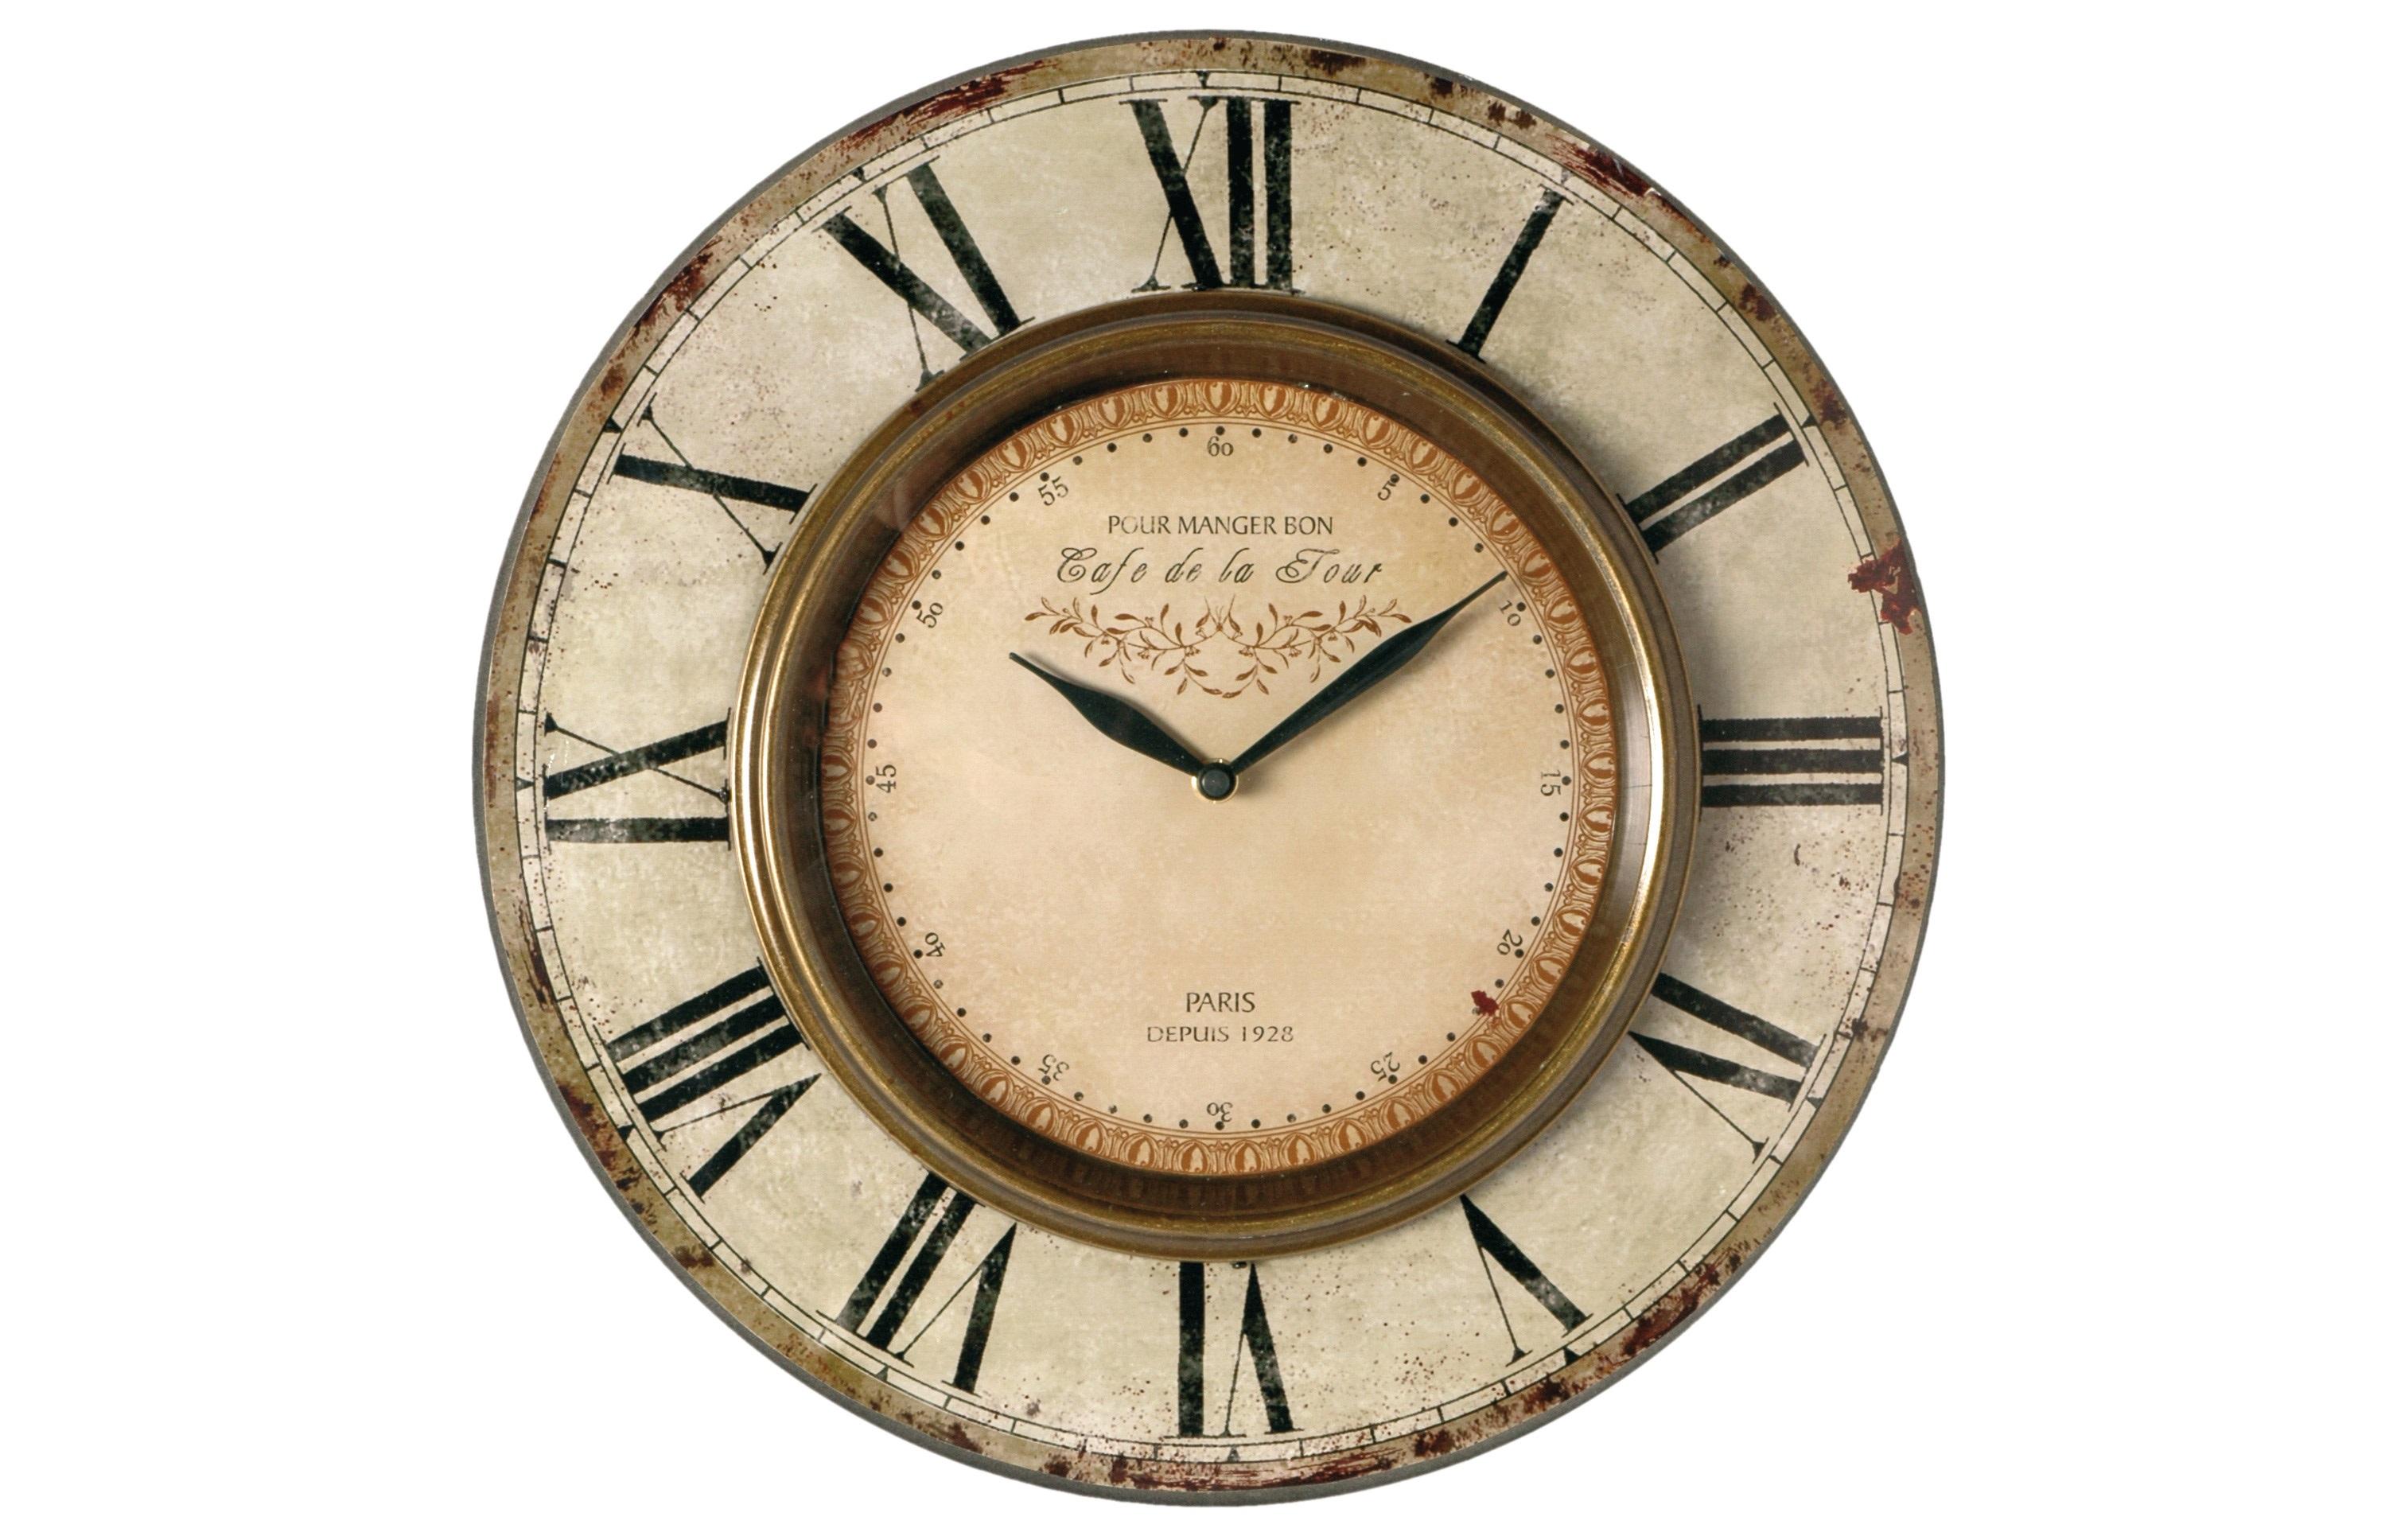 Настенные часыНастенные часы<br>Батарейки типа AА.<br><br>Material: Дерево<br>Length см: None<br>Width см: None<br>Depth см: 3<br>Height см: None<br>Diameter см: 38,5